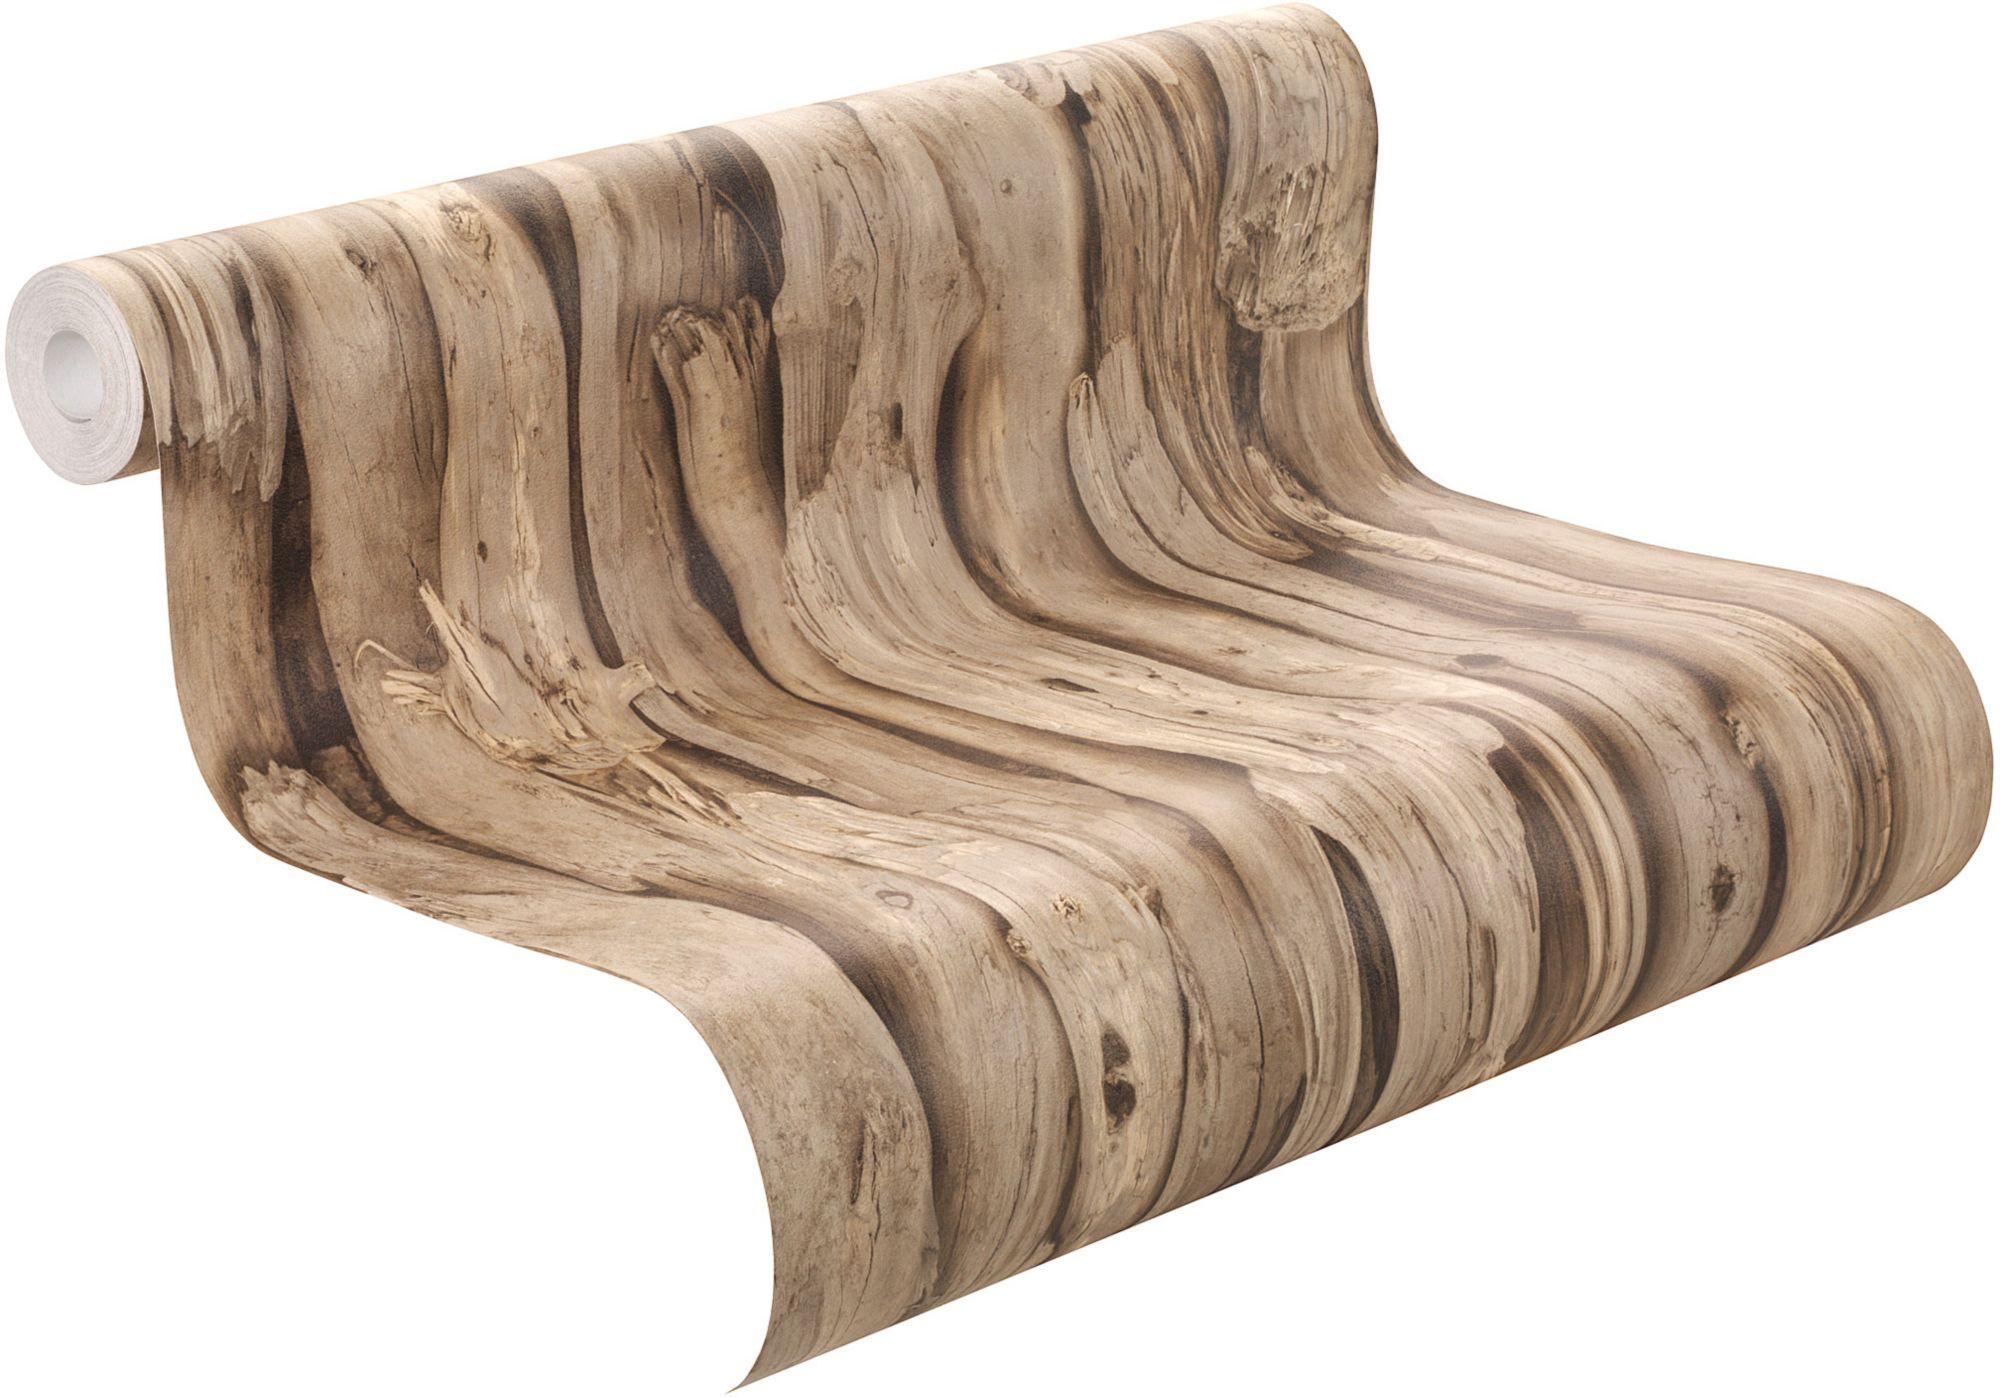 kuchenmobel tapezieren : Vliestapete, Rasch, ?African Queen, Holz? Schwab Versand Vintage ...